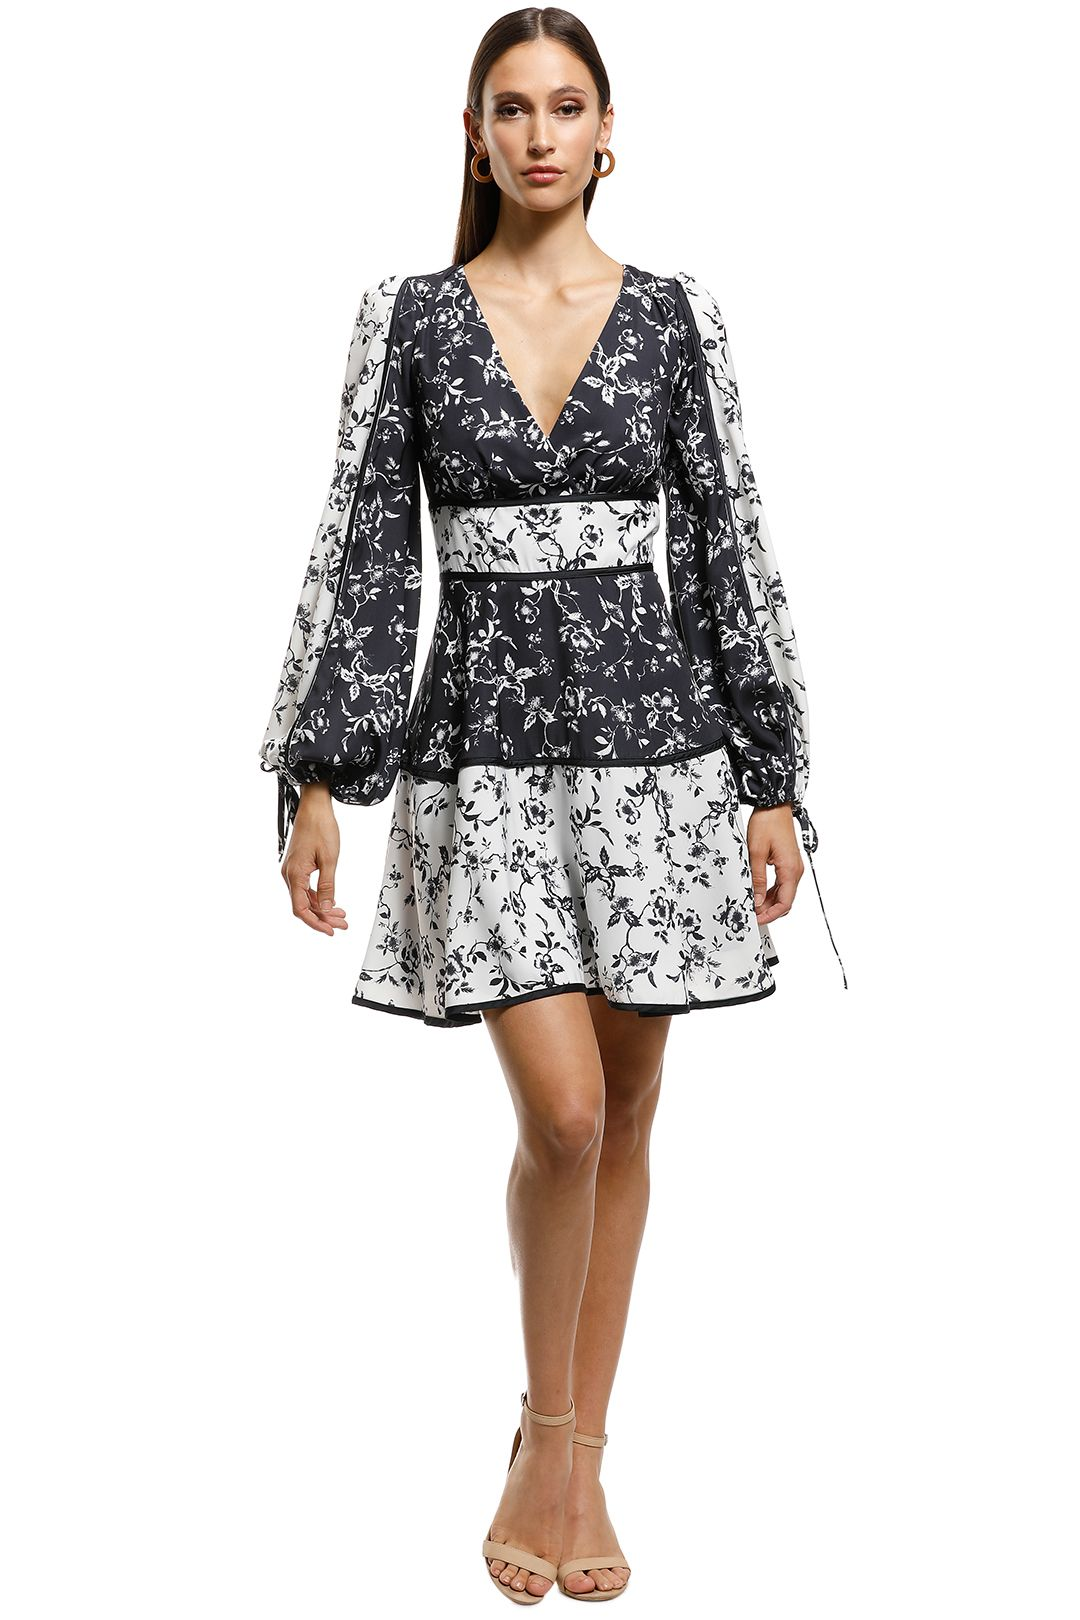 Keepsake the Label-Depend LS Dress-Black-White-Front